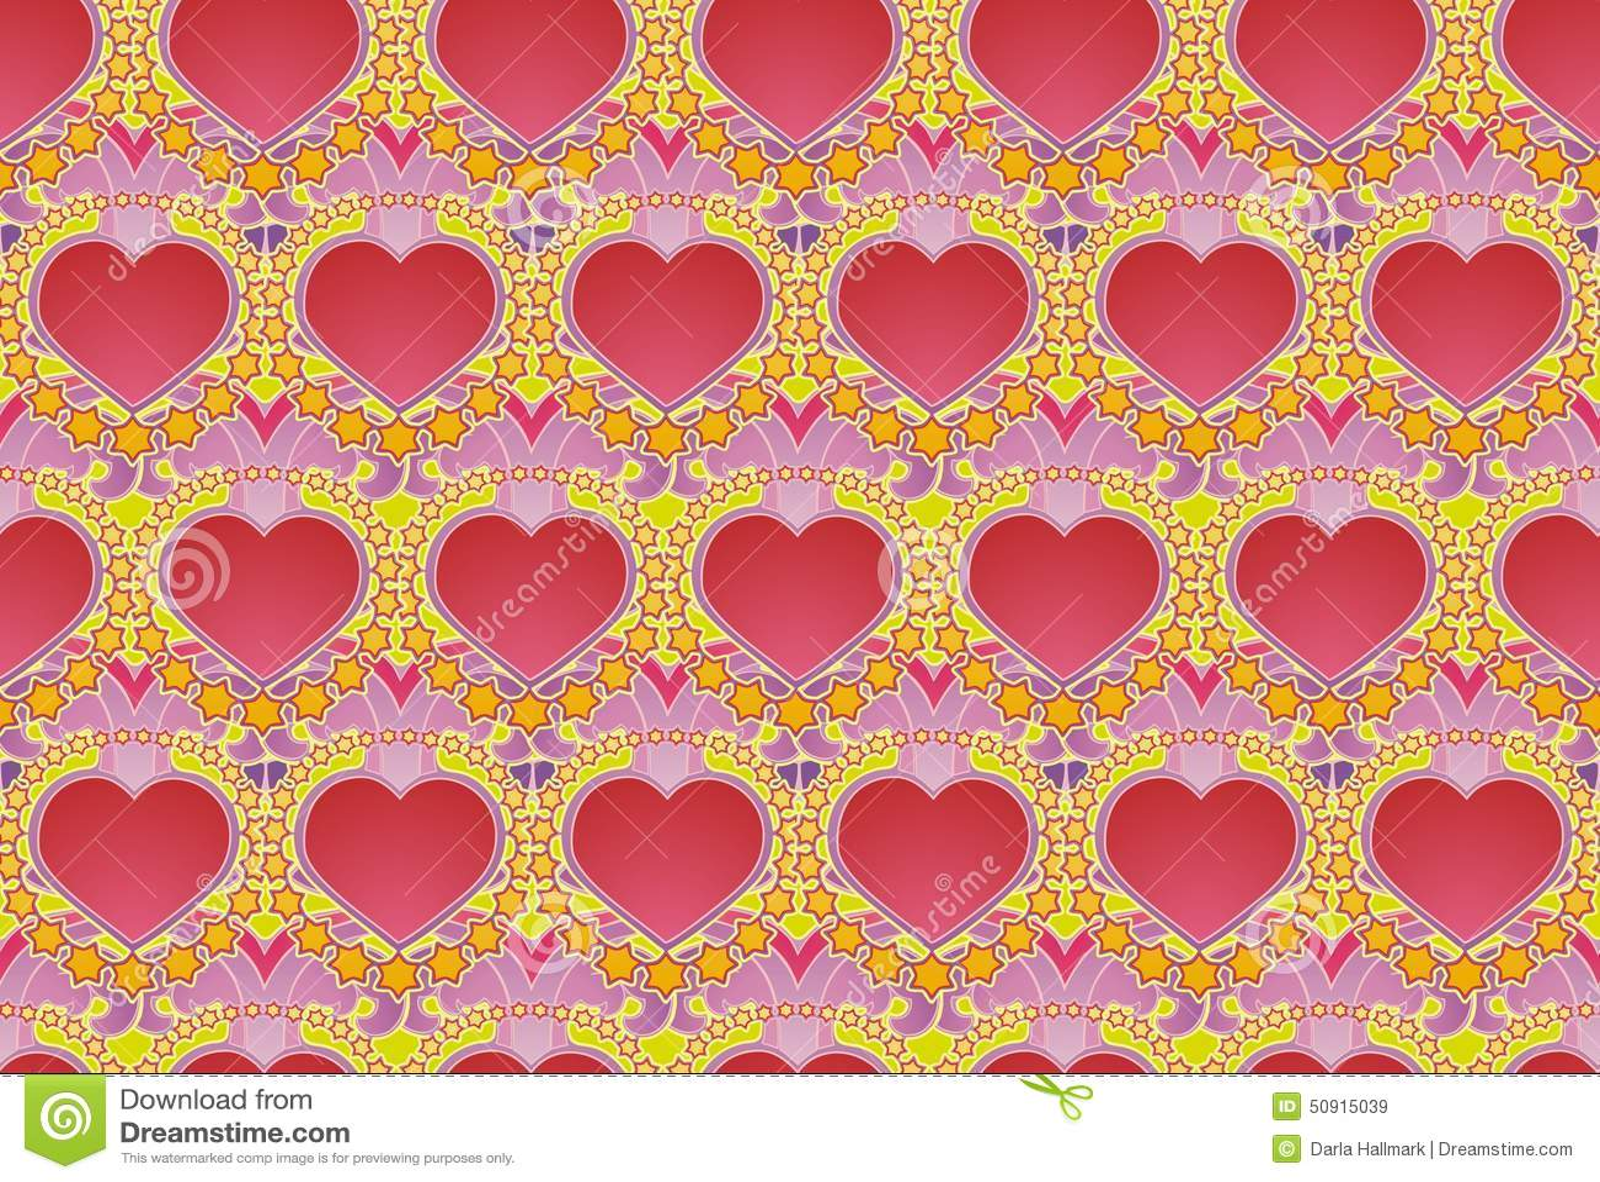 hearts and stars wallpaper stock illustration. illustration of